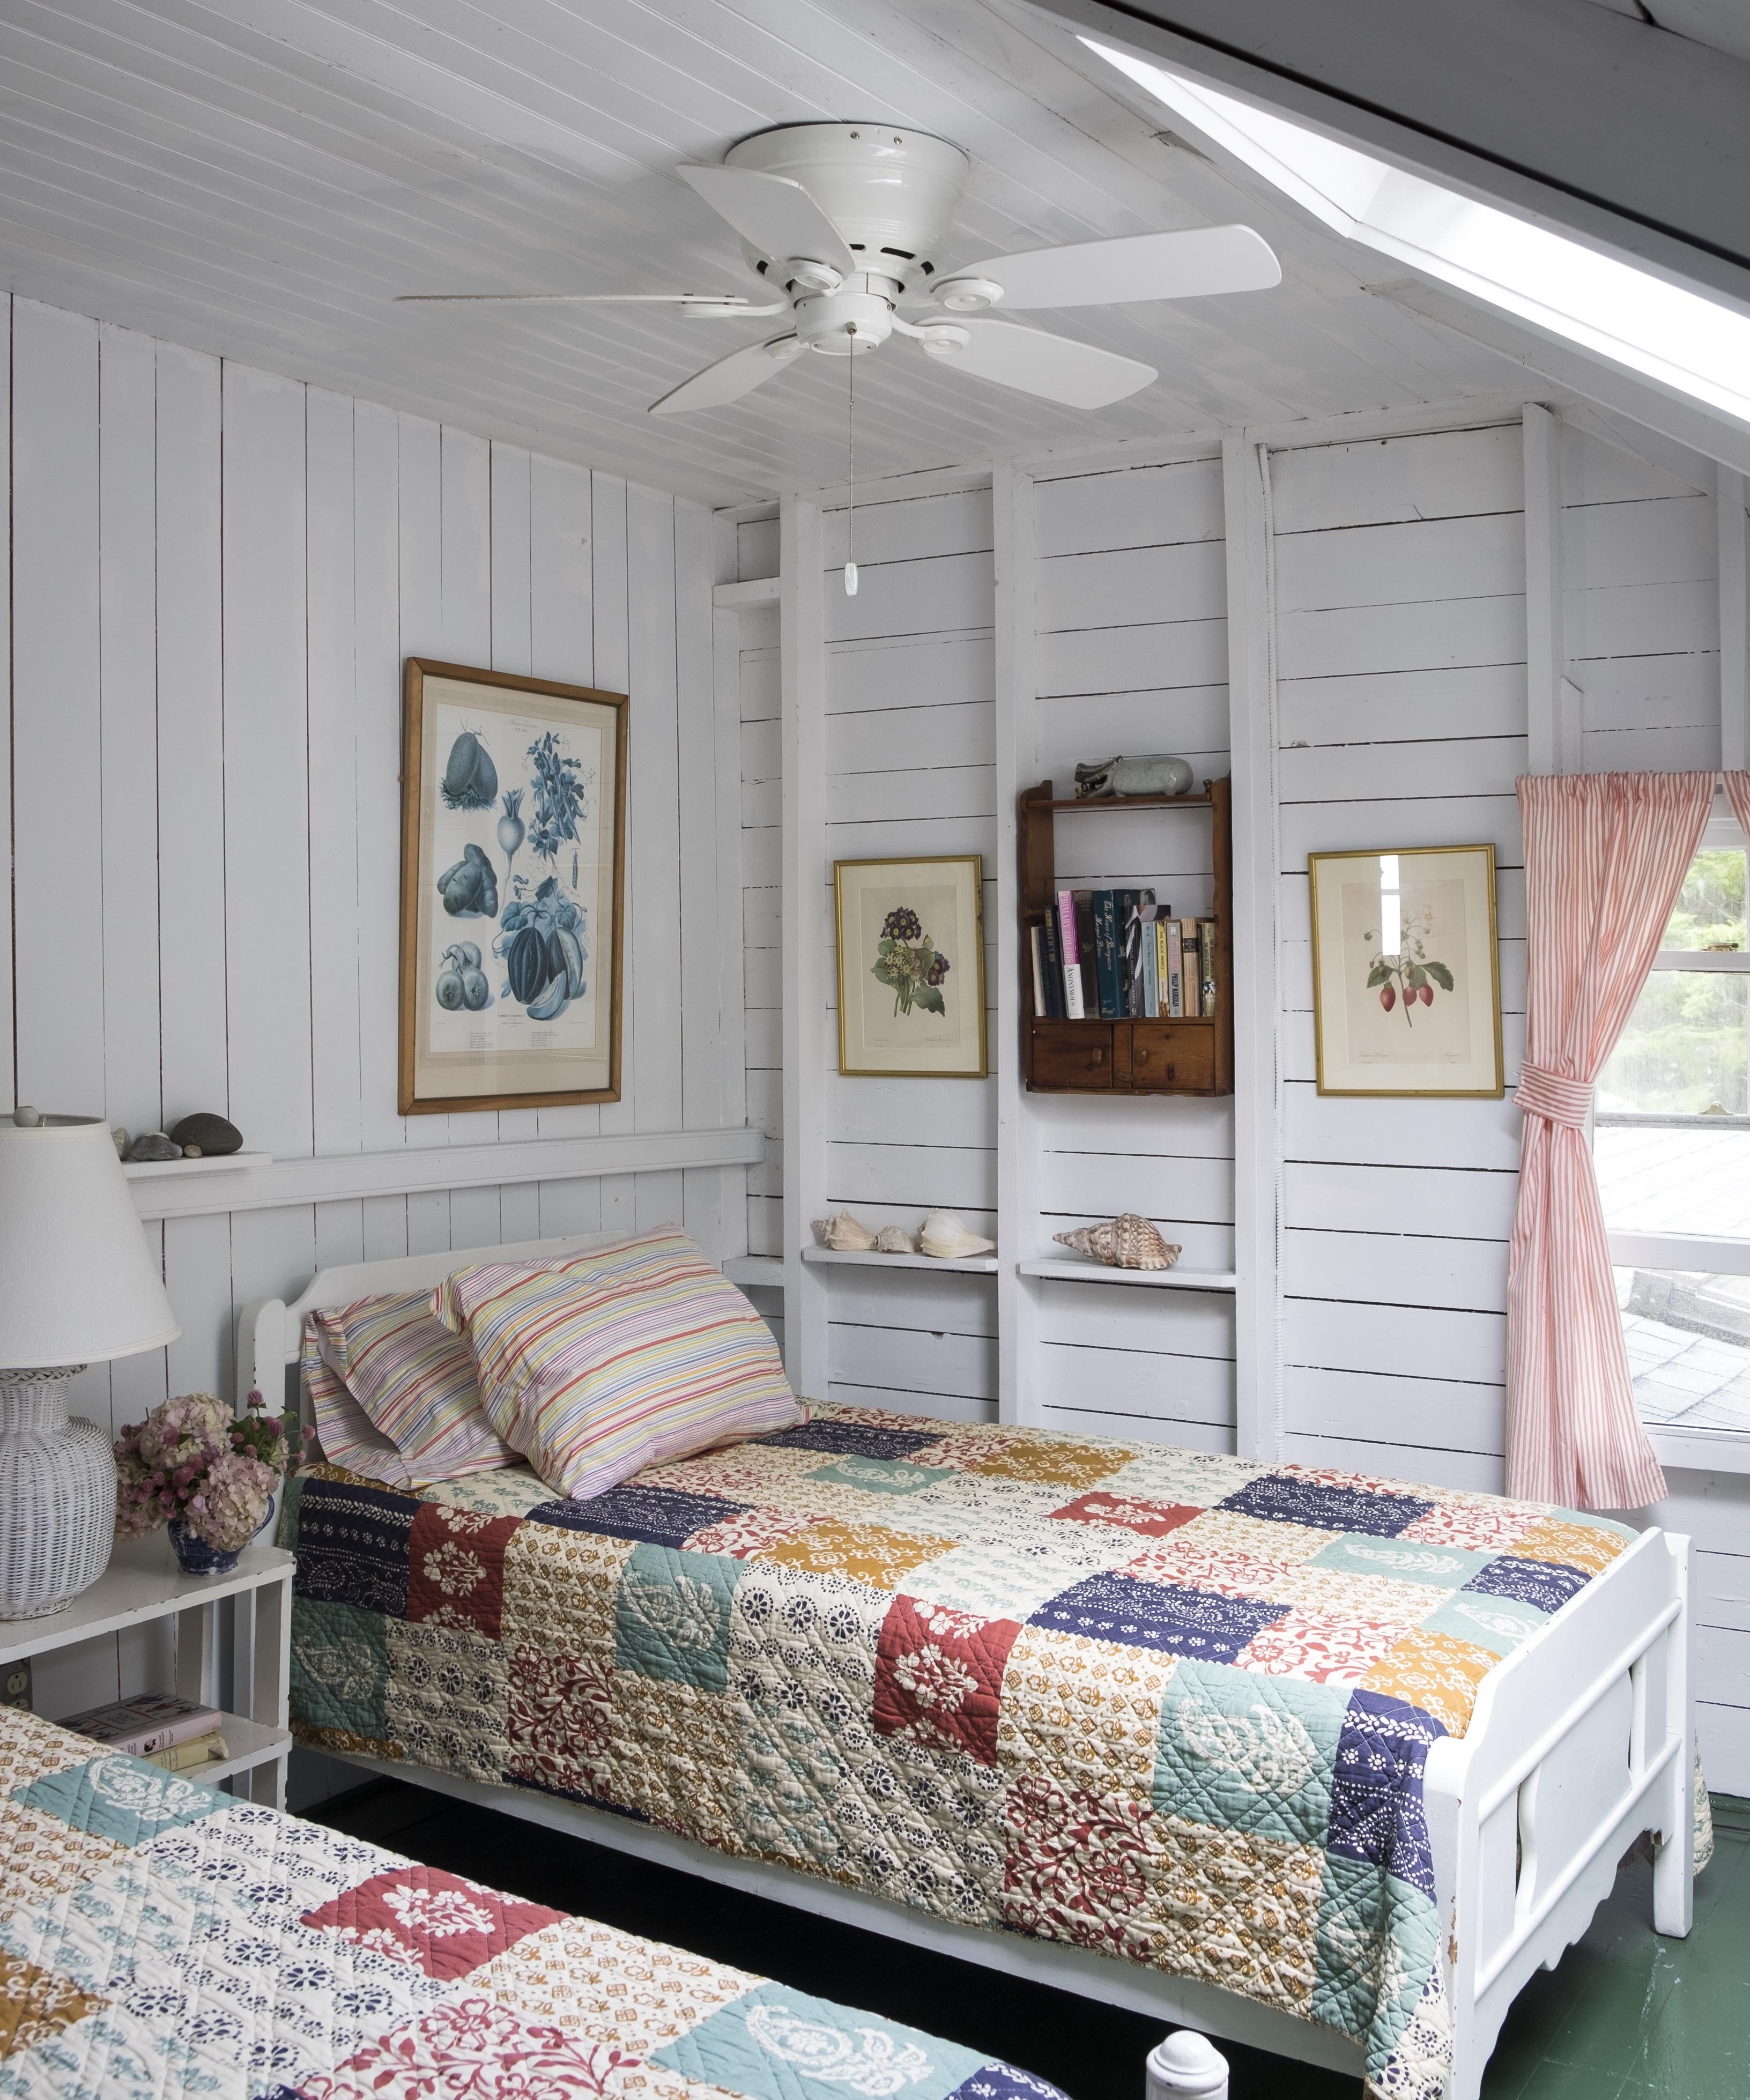 HB_Cameron_Maine-077- room 1